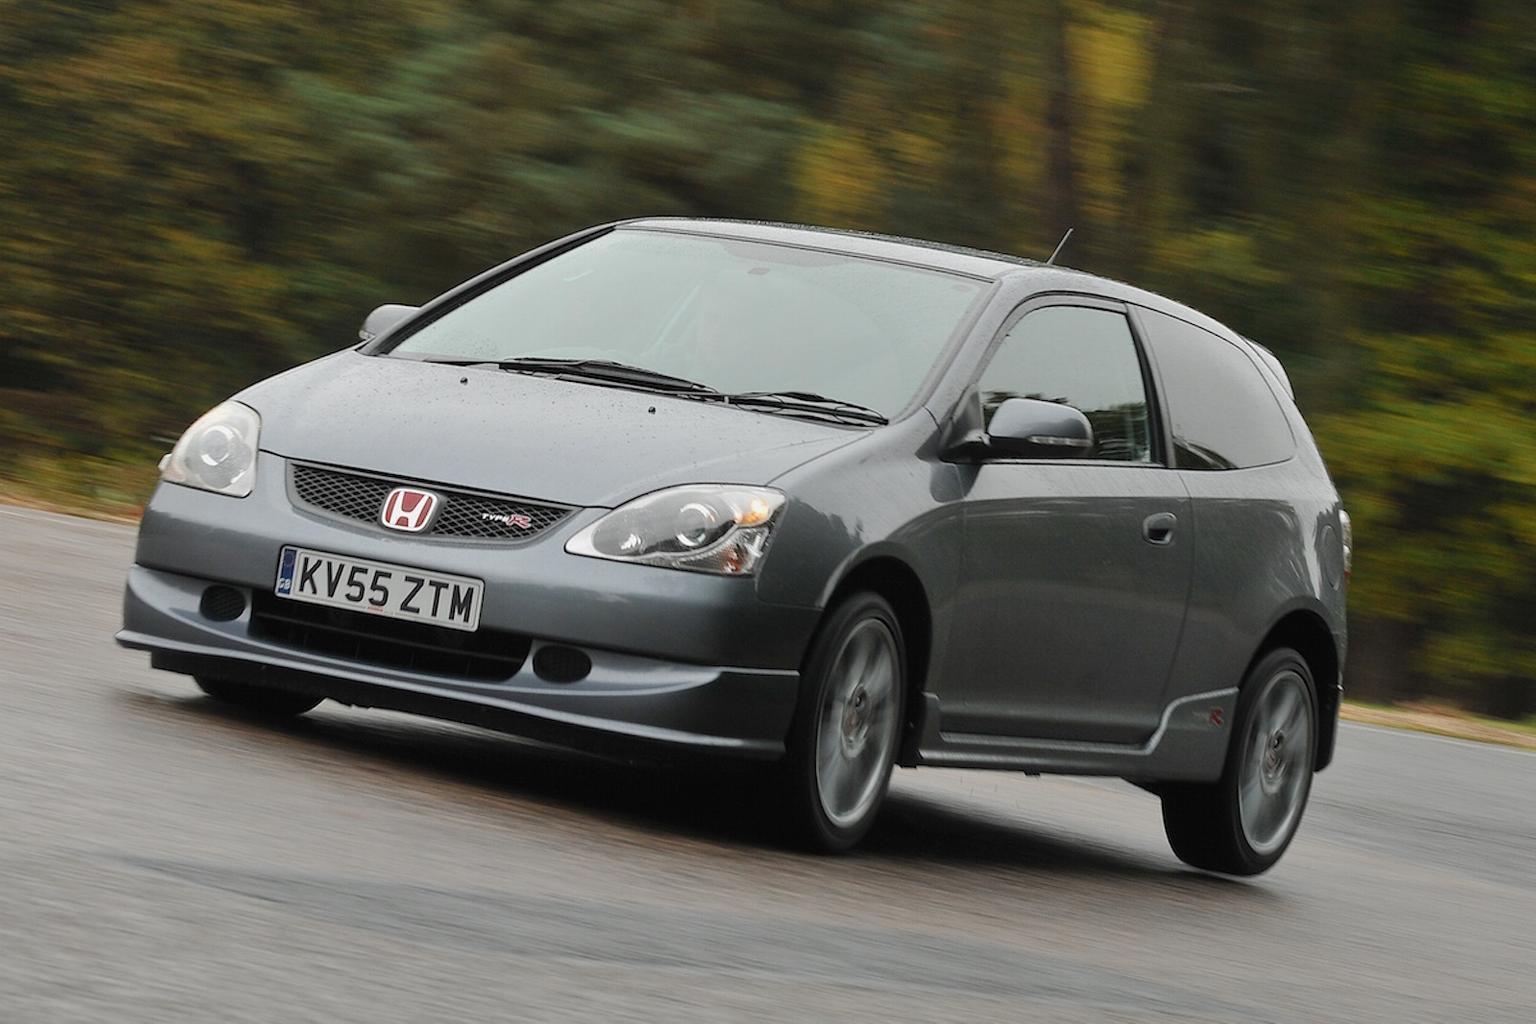 Honda Civic Type R - Rewind Wednesday